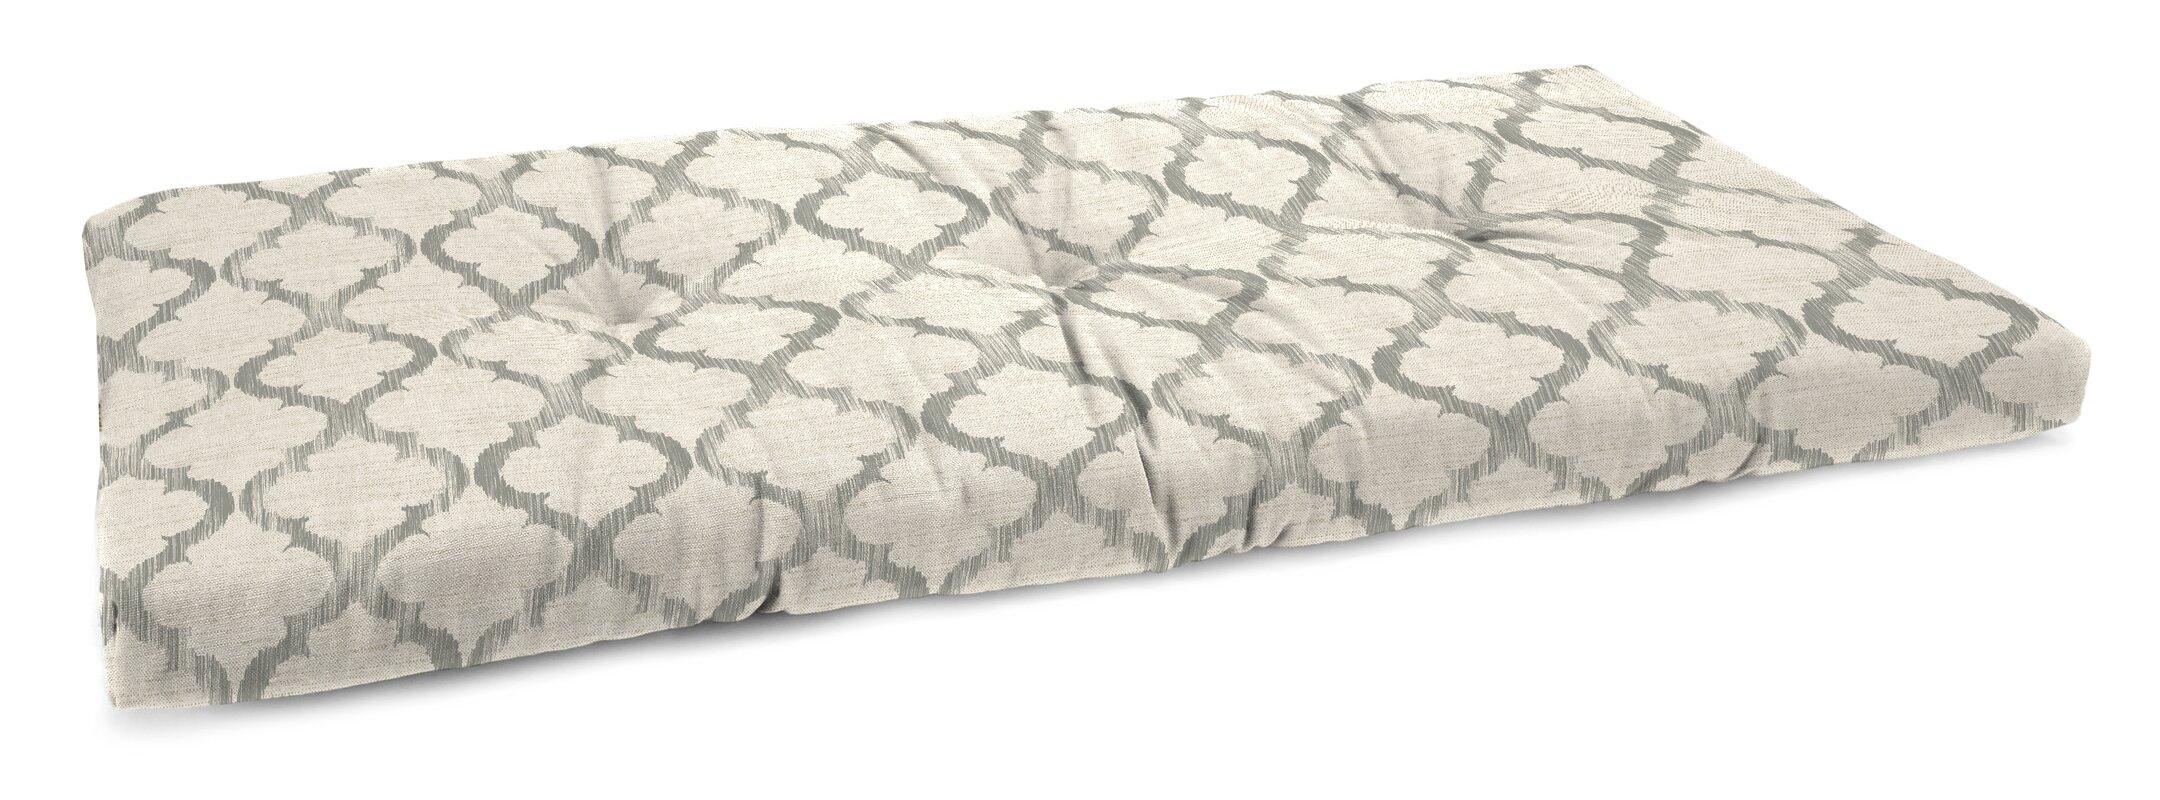 Laurel Foundry Modern Farmhouse Tufted Linen Indoor Bench Cushion ...